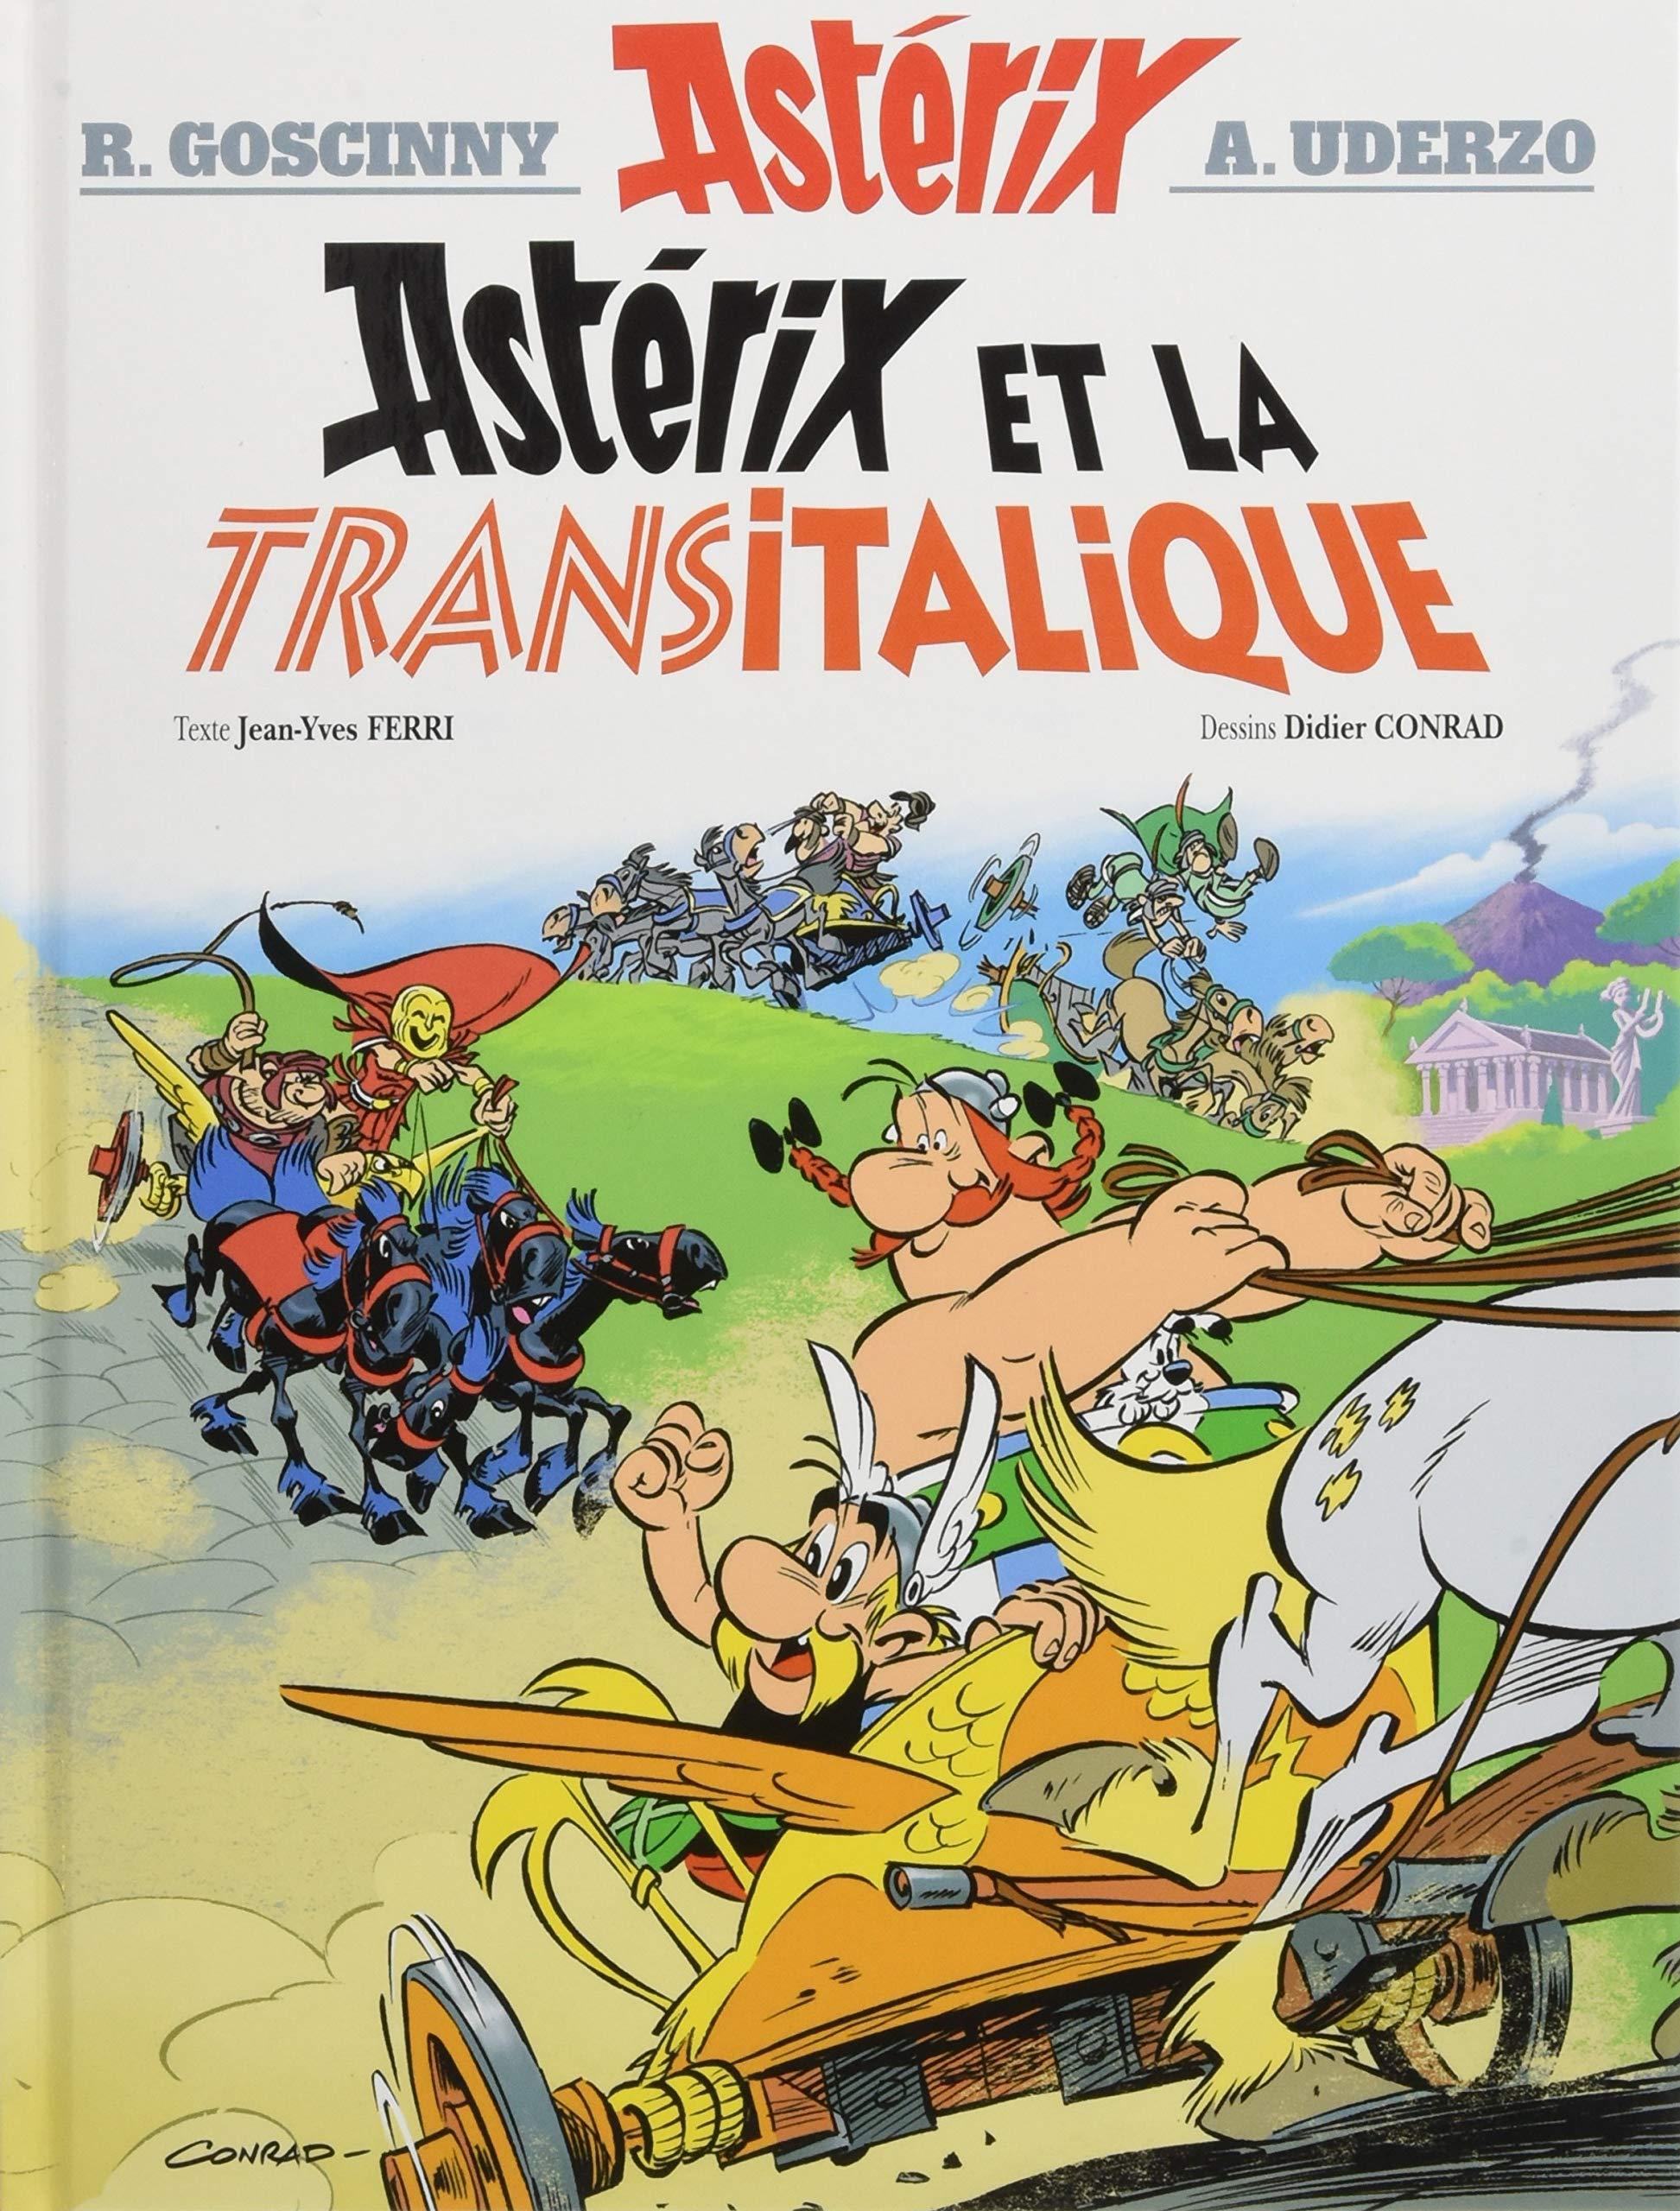 Asterix 37 - Astérix et la Transitalique: Bande dessinée